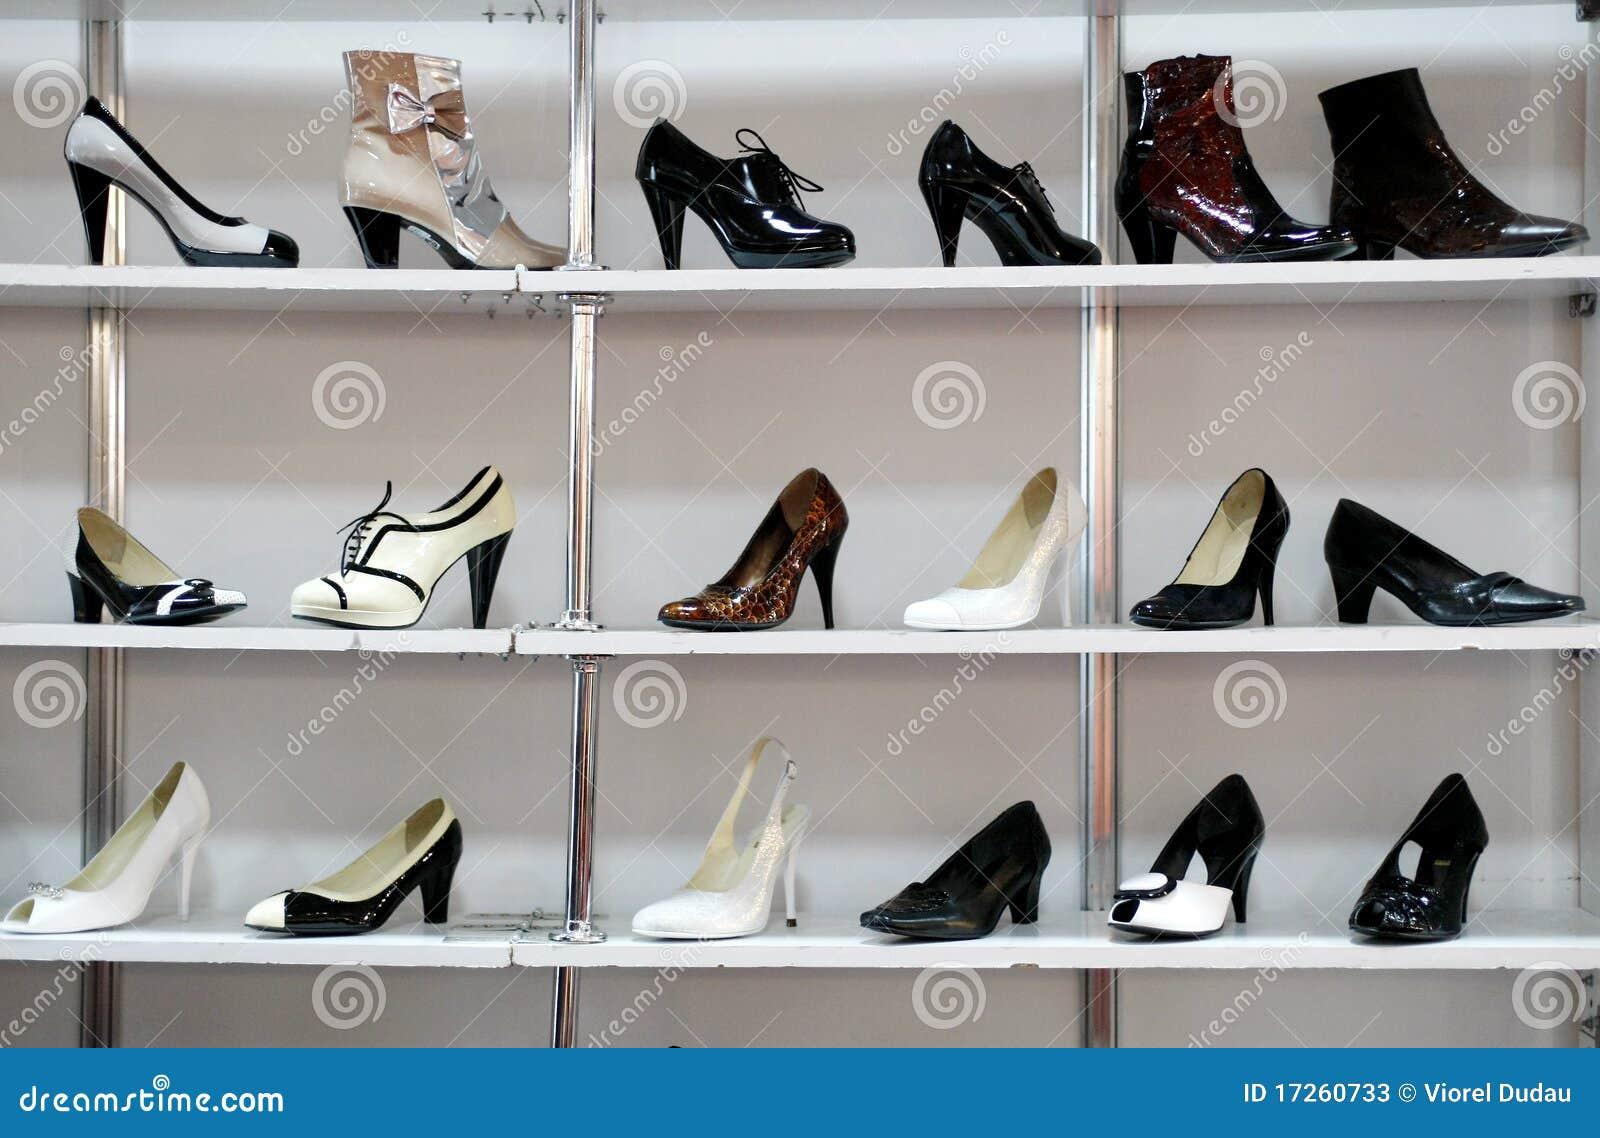 Business plan magasin de chaussures luxus